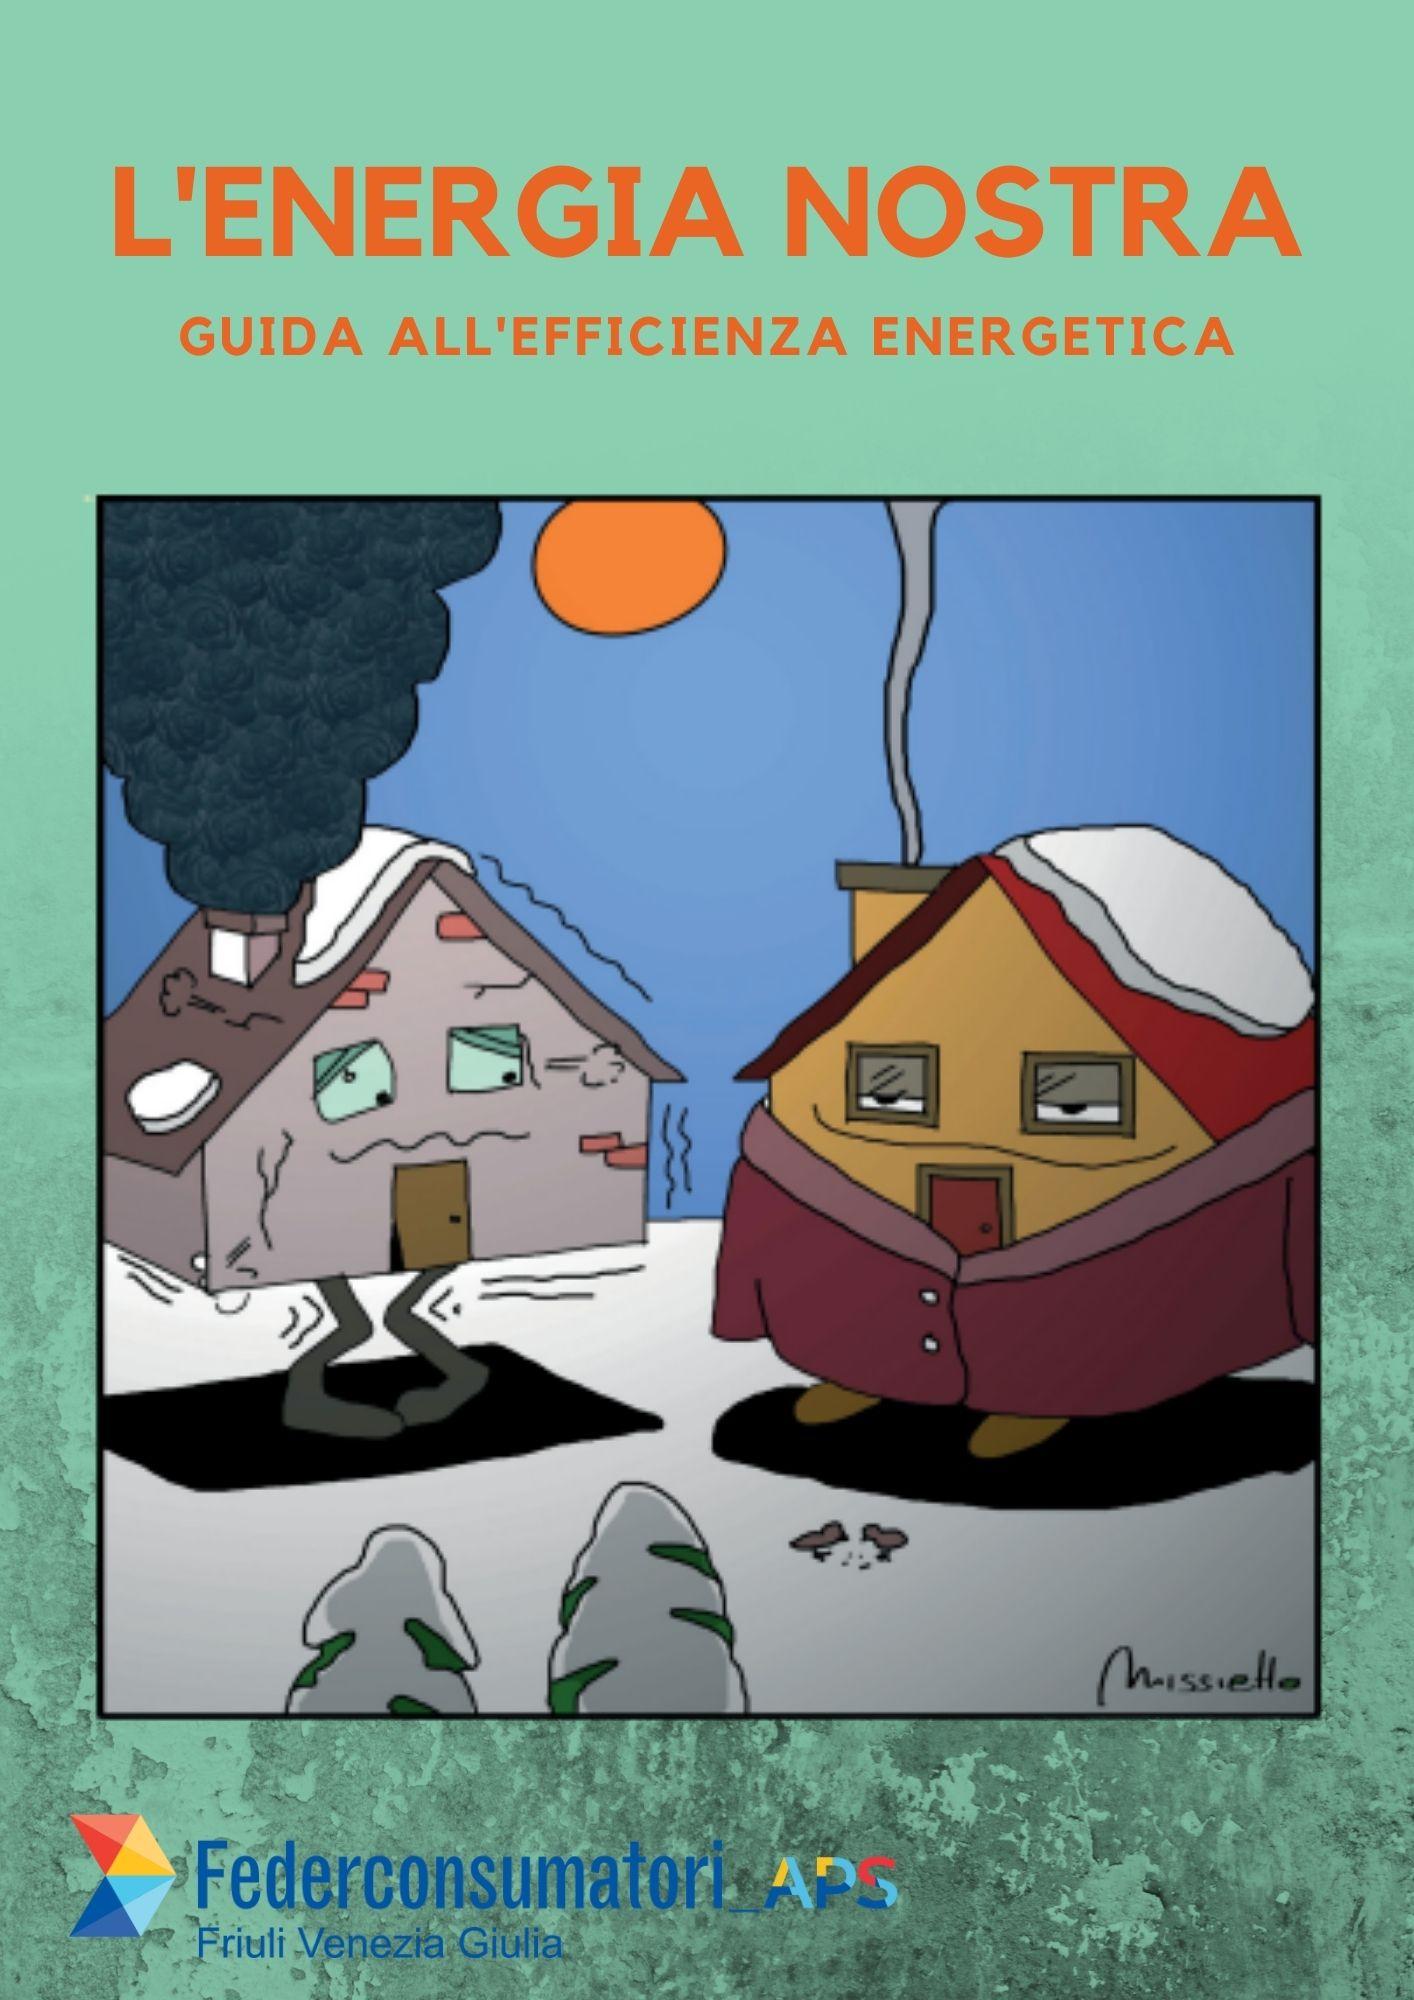 L'energia nostra guida efficienza energetica